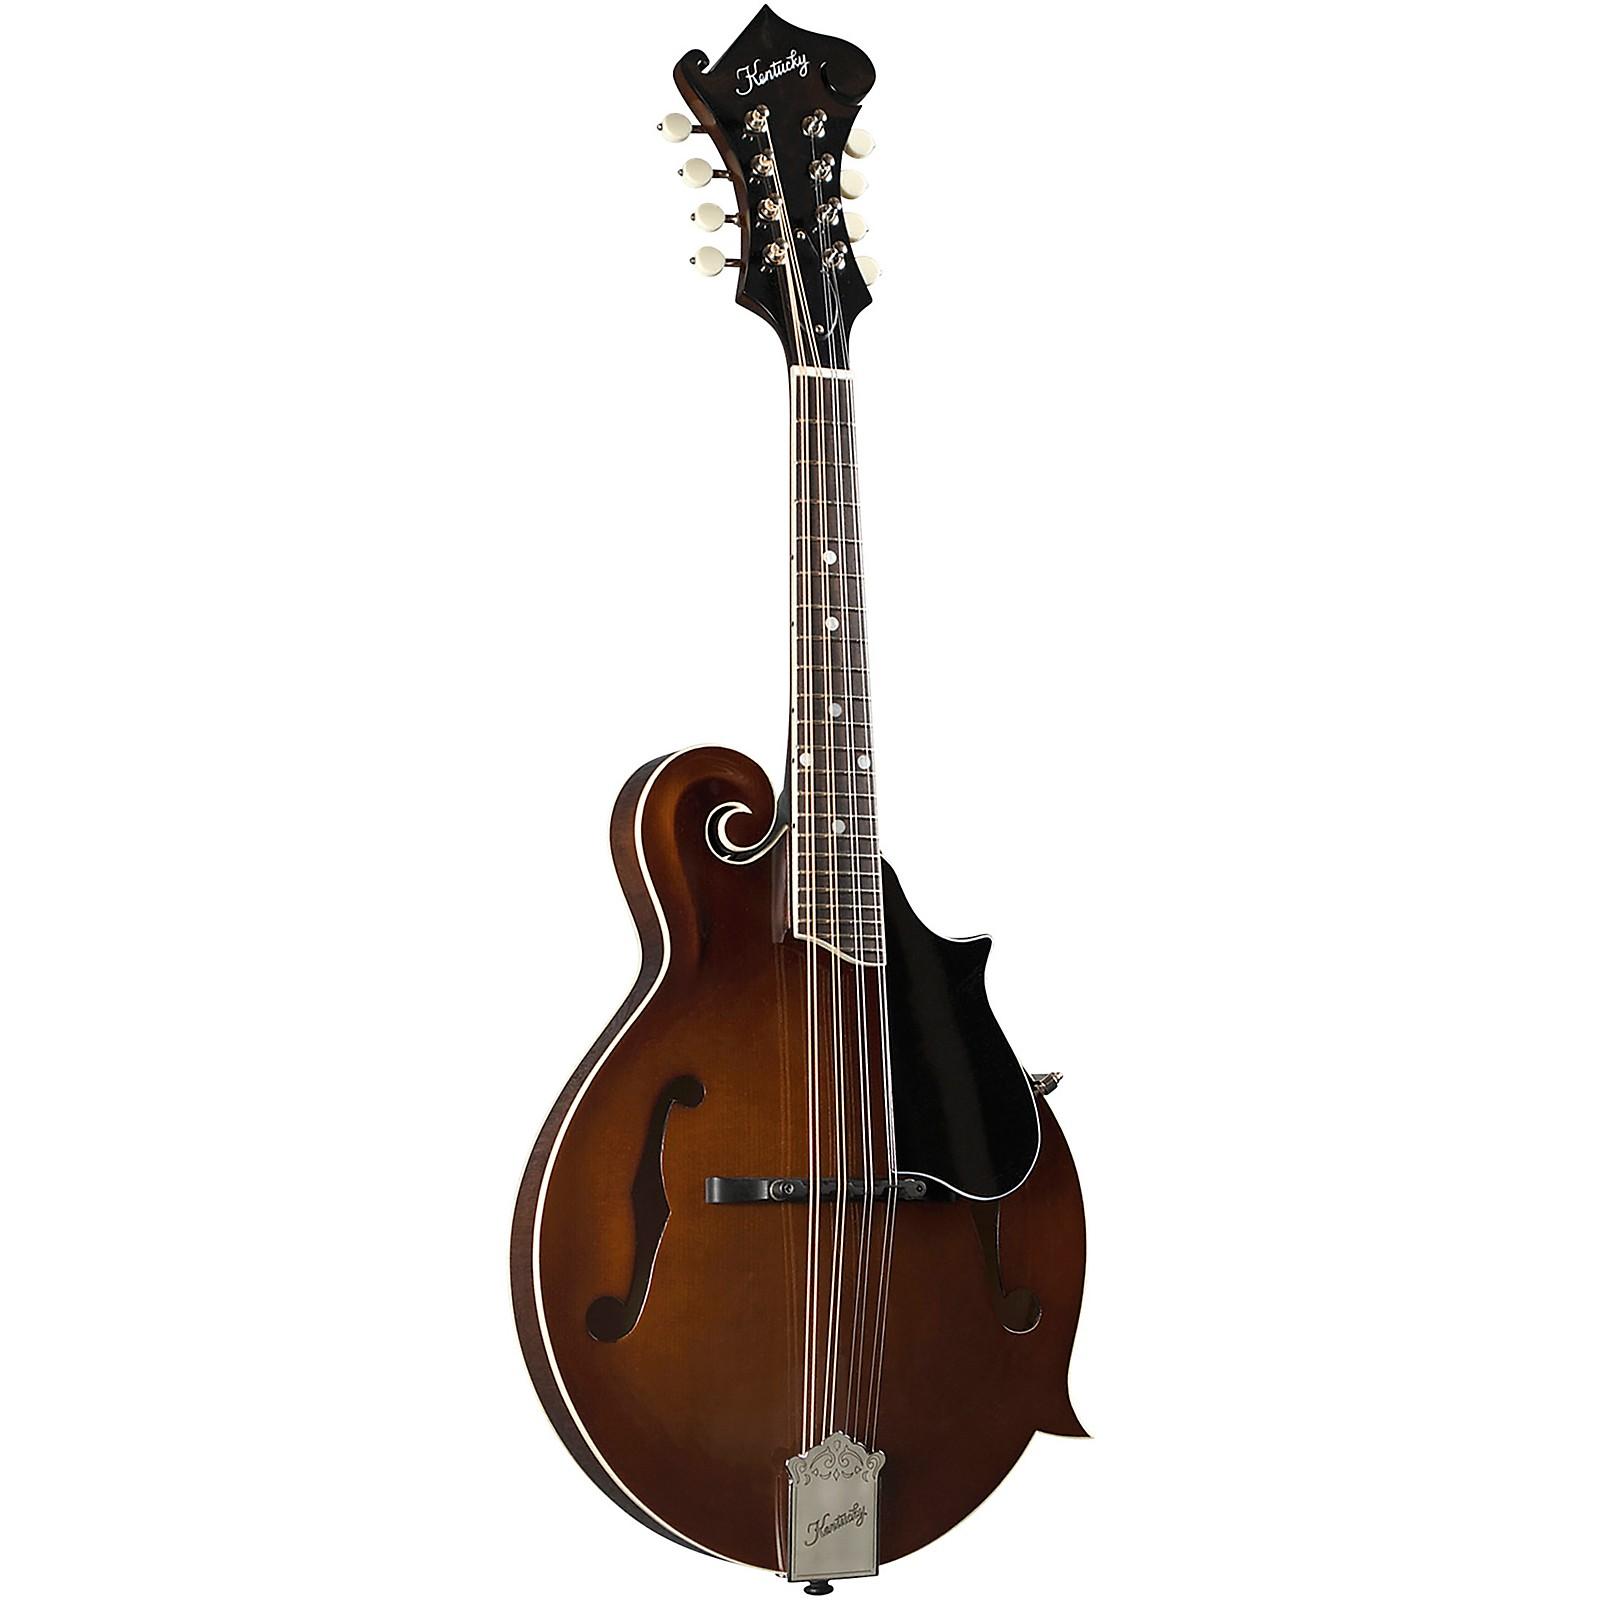 Kentucky KM-656 Standard F-model Mandolin